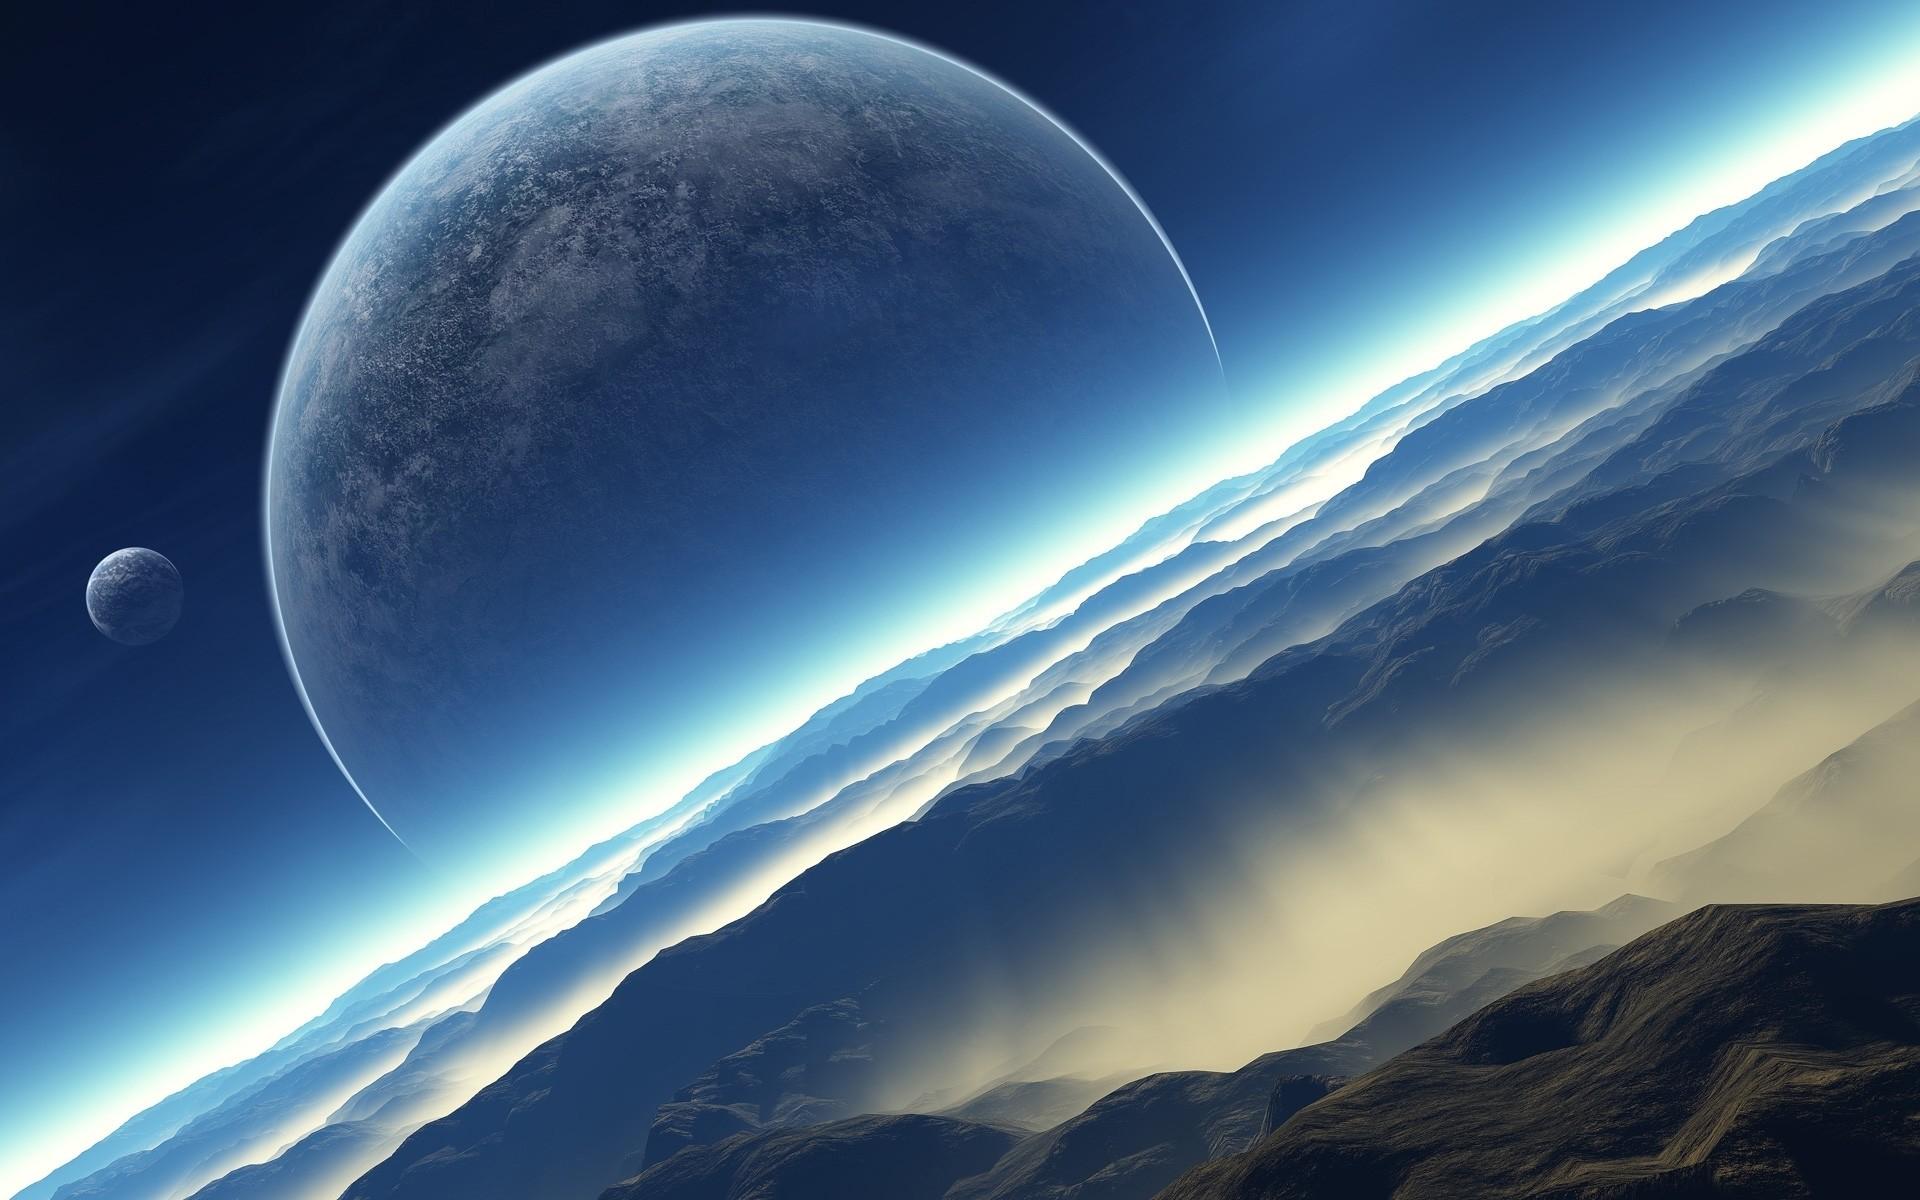 Space Art Wallpaper HD – https://www.0wallpapers.com/2416